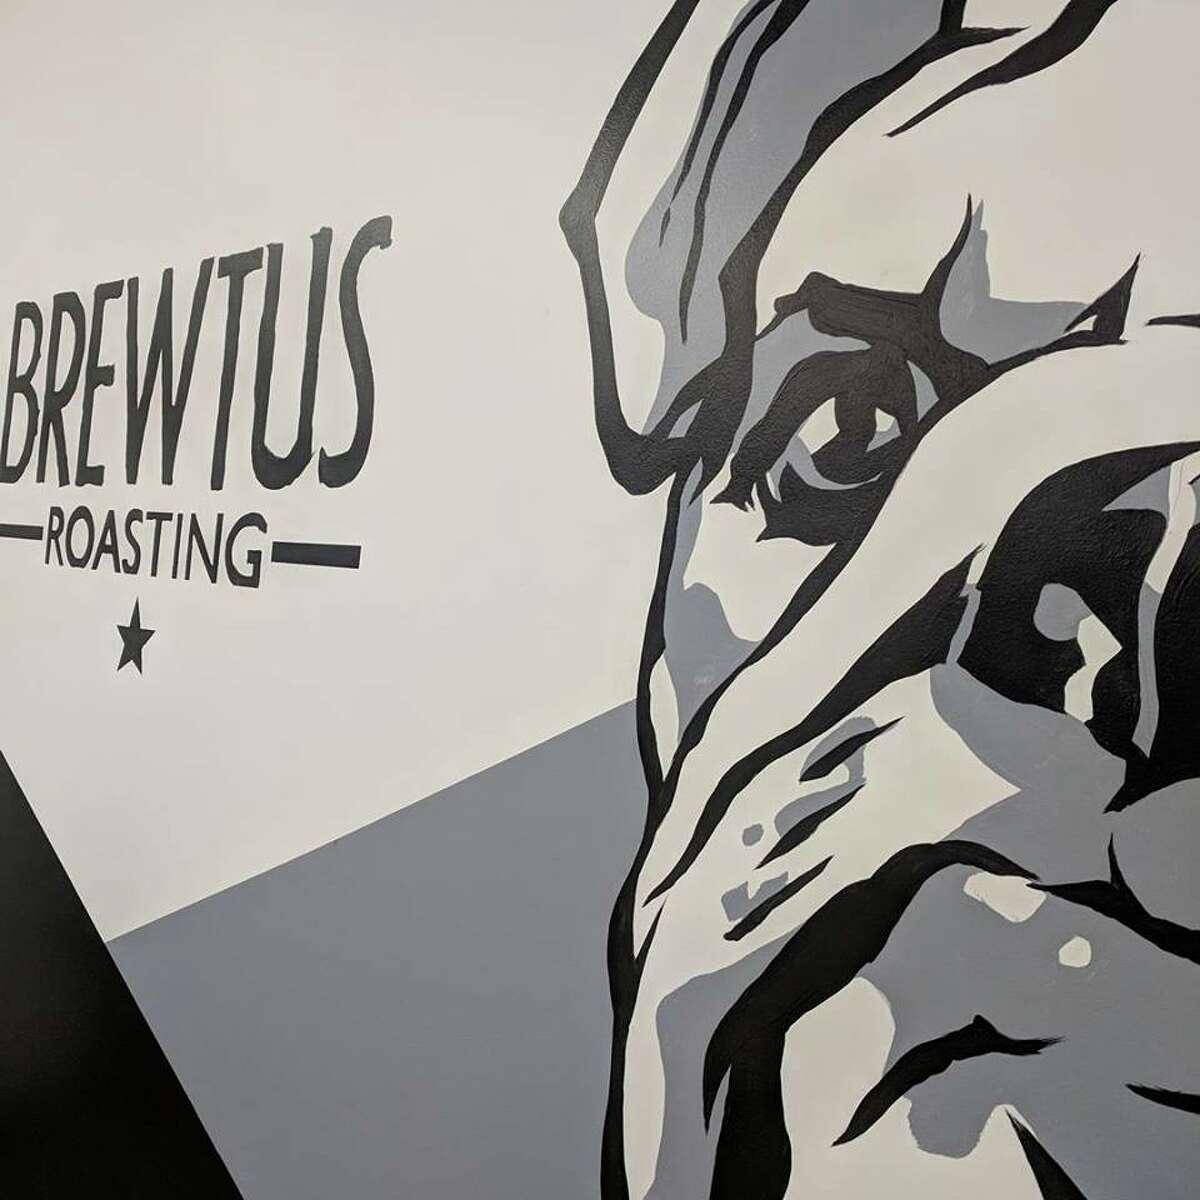 Brewtus Roasting is building a roastery and tasting room on Hallwood Road in Delmar.